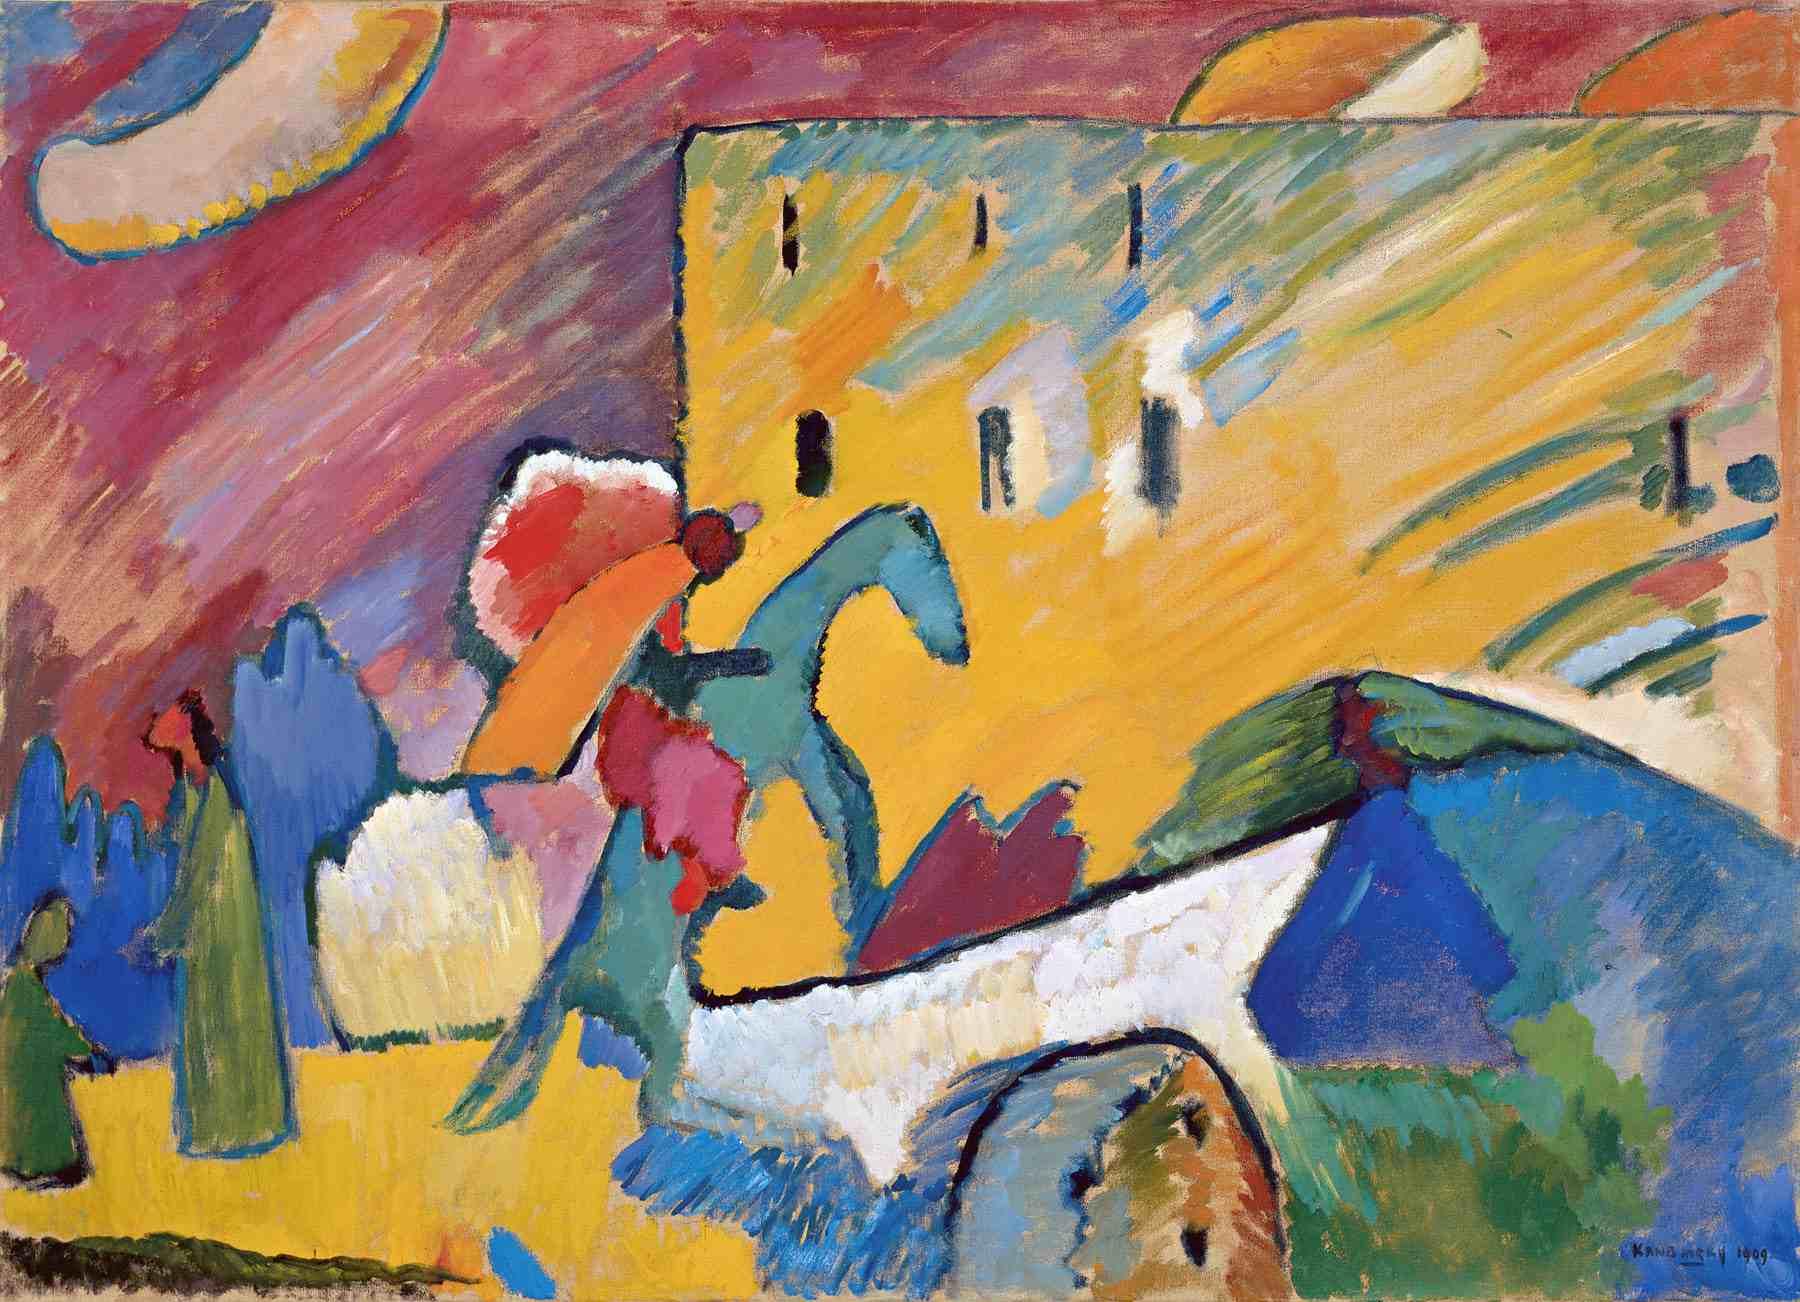 Wassily Kandinsky (Russian, 1866-1944) Wassily Kandinsky (Russian, 1866-1944). Improvisation 3, 1909. Oil on canvas. 37 x 51 1/8 in. (94 x 130 cm). Gift of Nina Kandinsky, 1976. Musée national d'art moderne, Centre Pompidou, Paris.